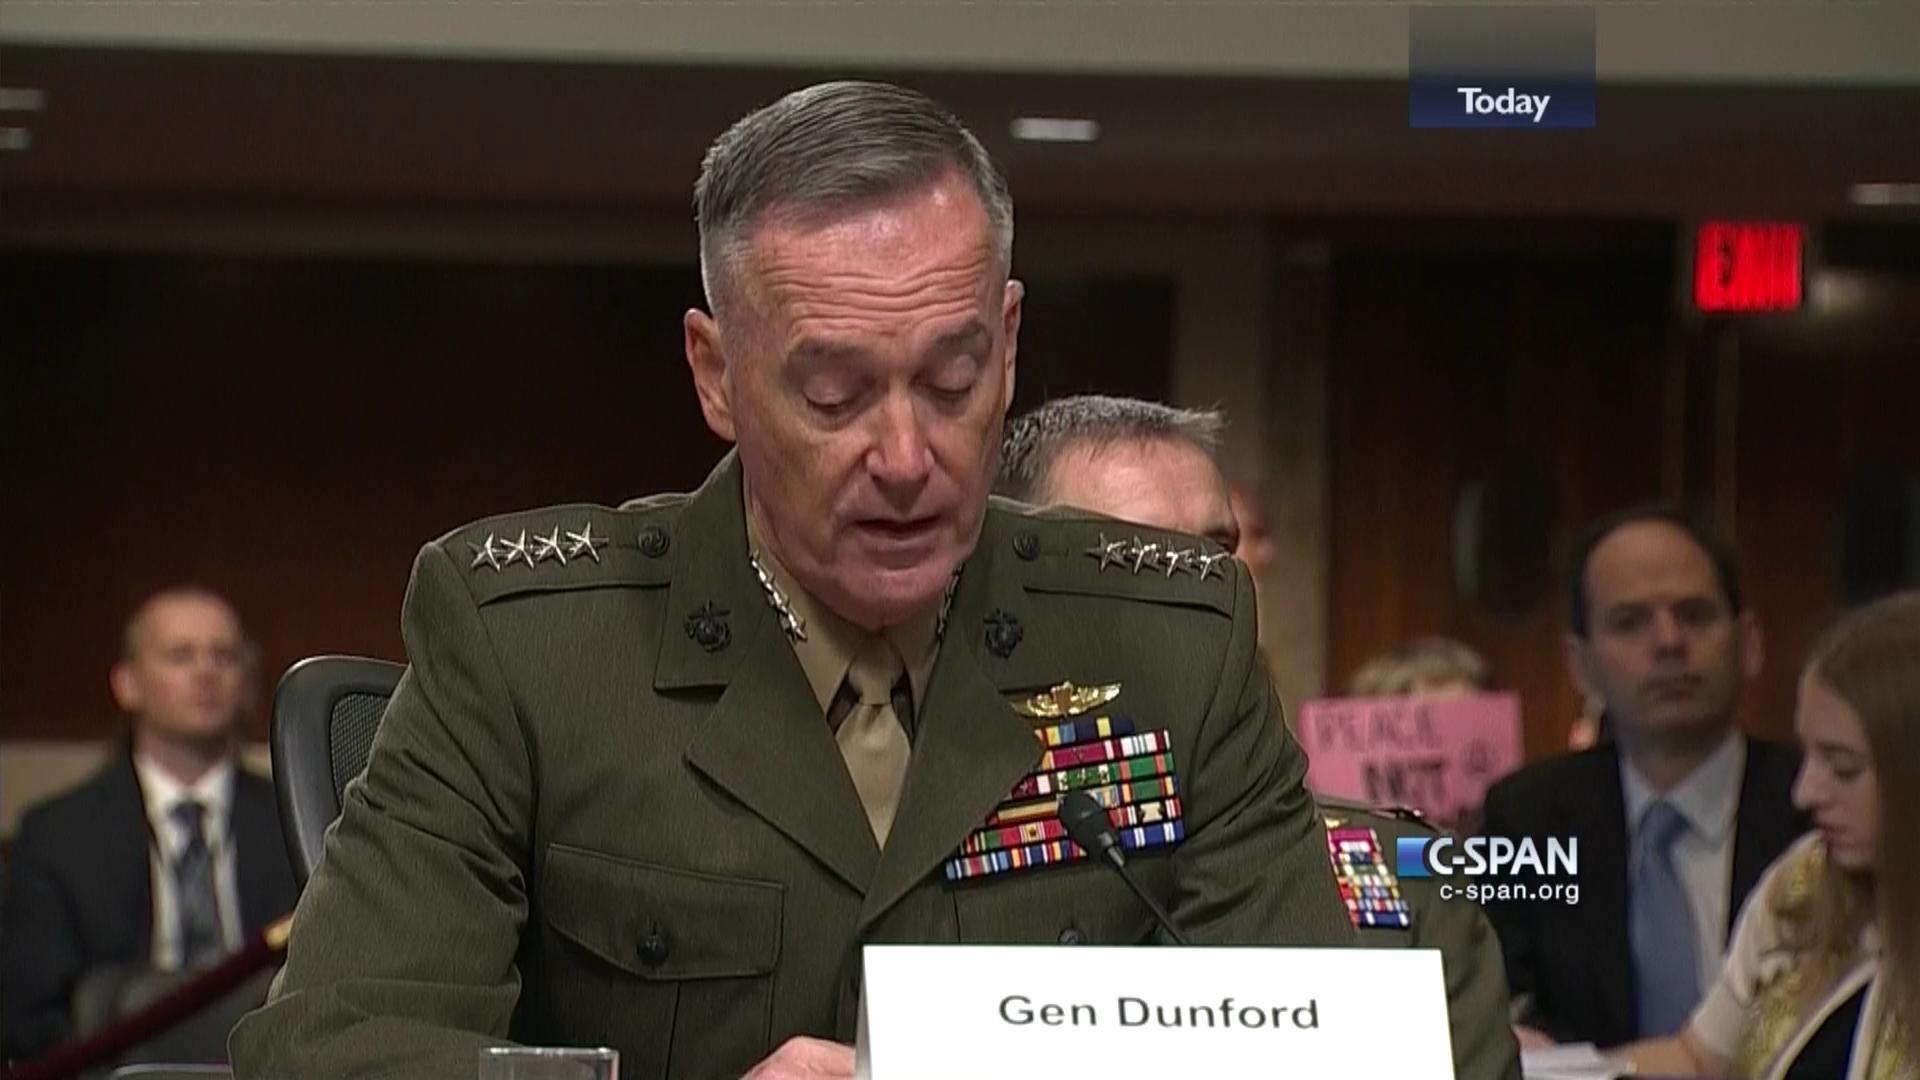 Defense Secretary Urged to Re-Evaluate Trans Service